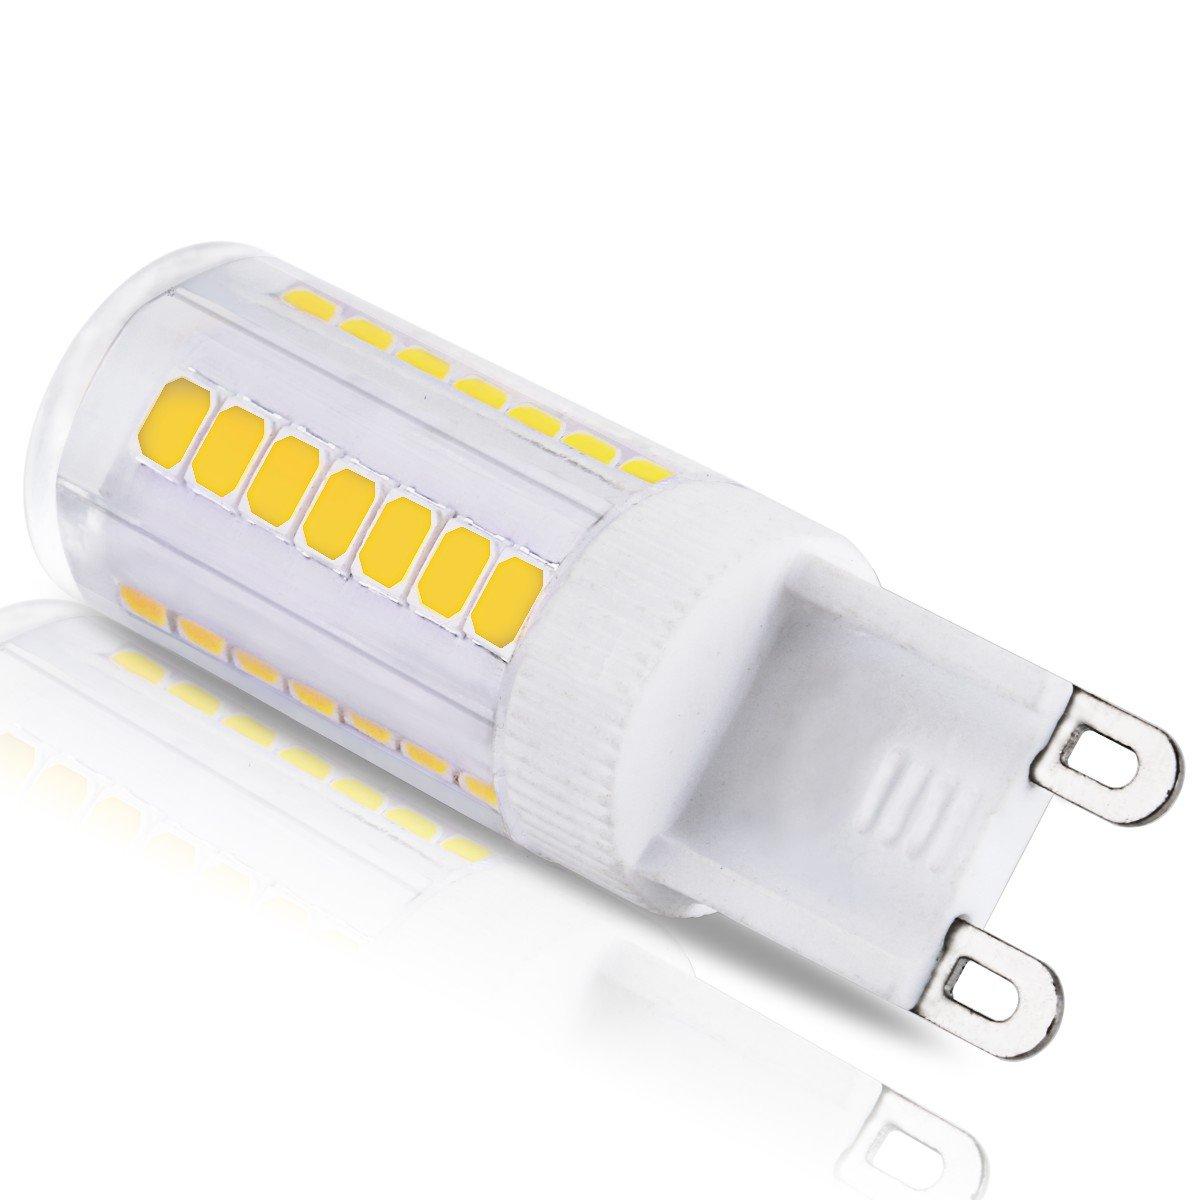 JandCase G9 LED Light Bulbs, 5W, 40W Halogen Equivalent, 400LM ...